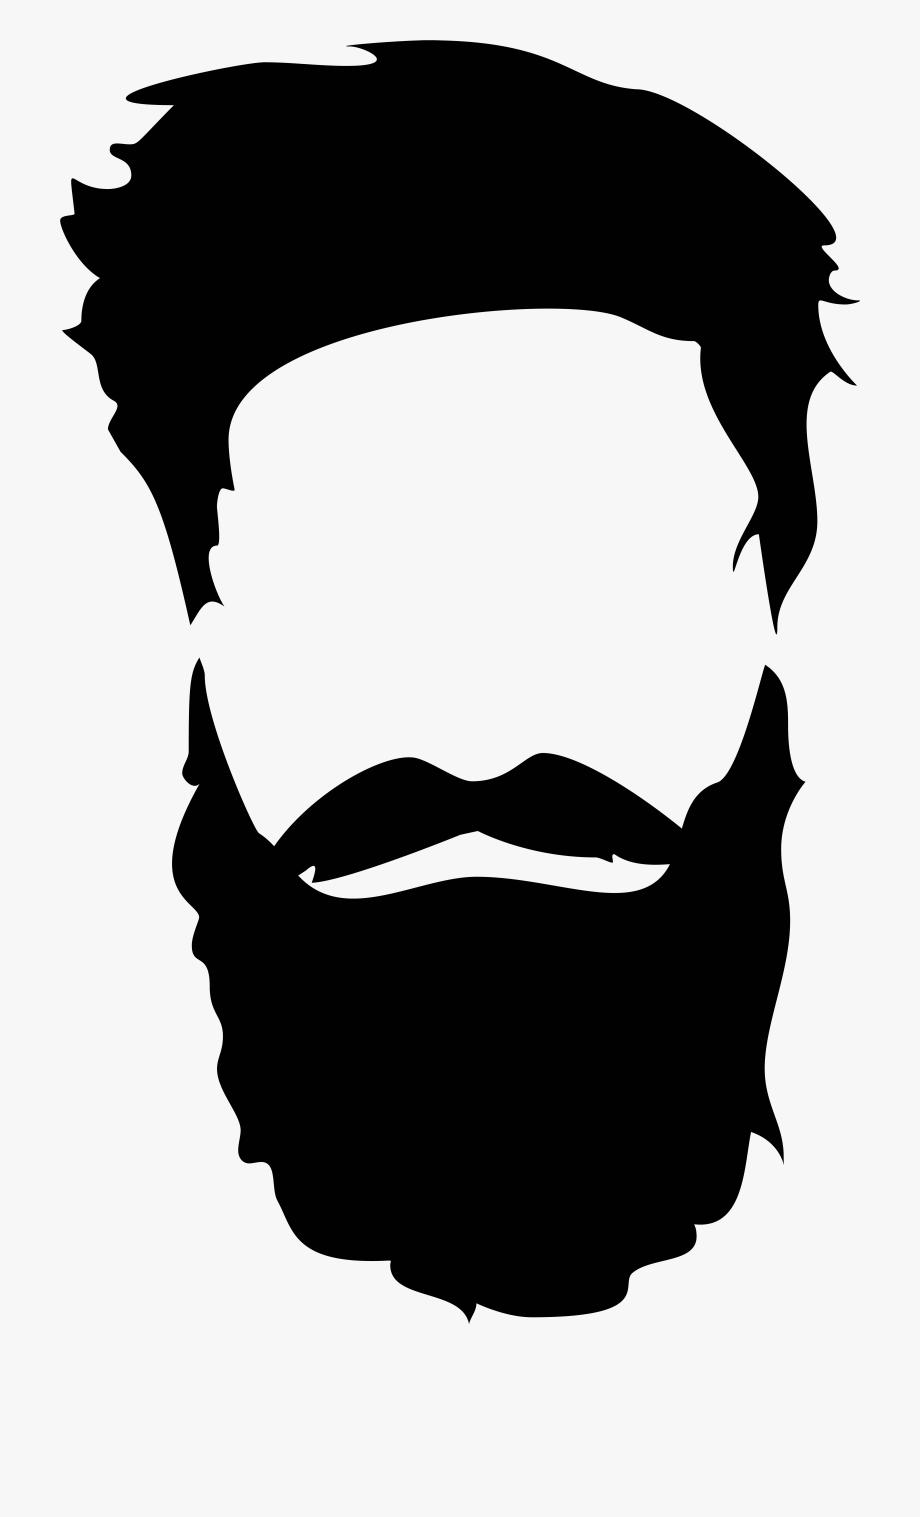 Bread and mustache png. Beard clipart beard face